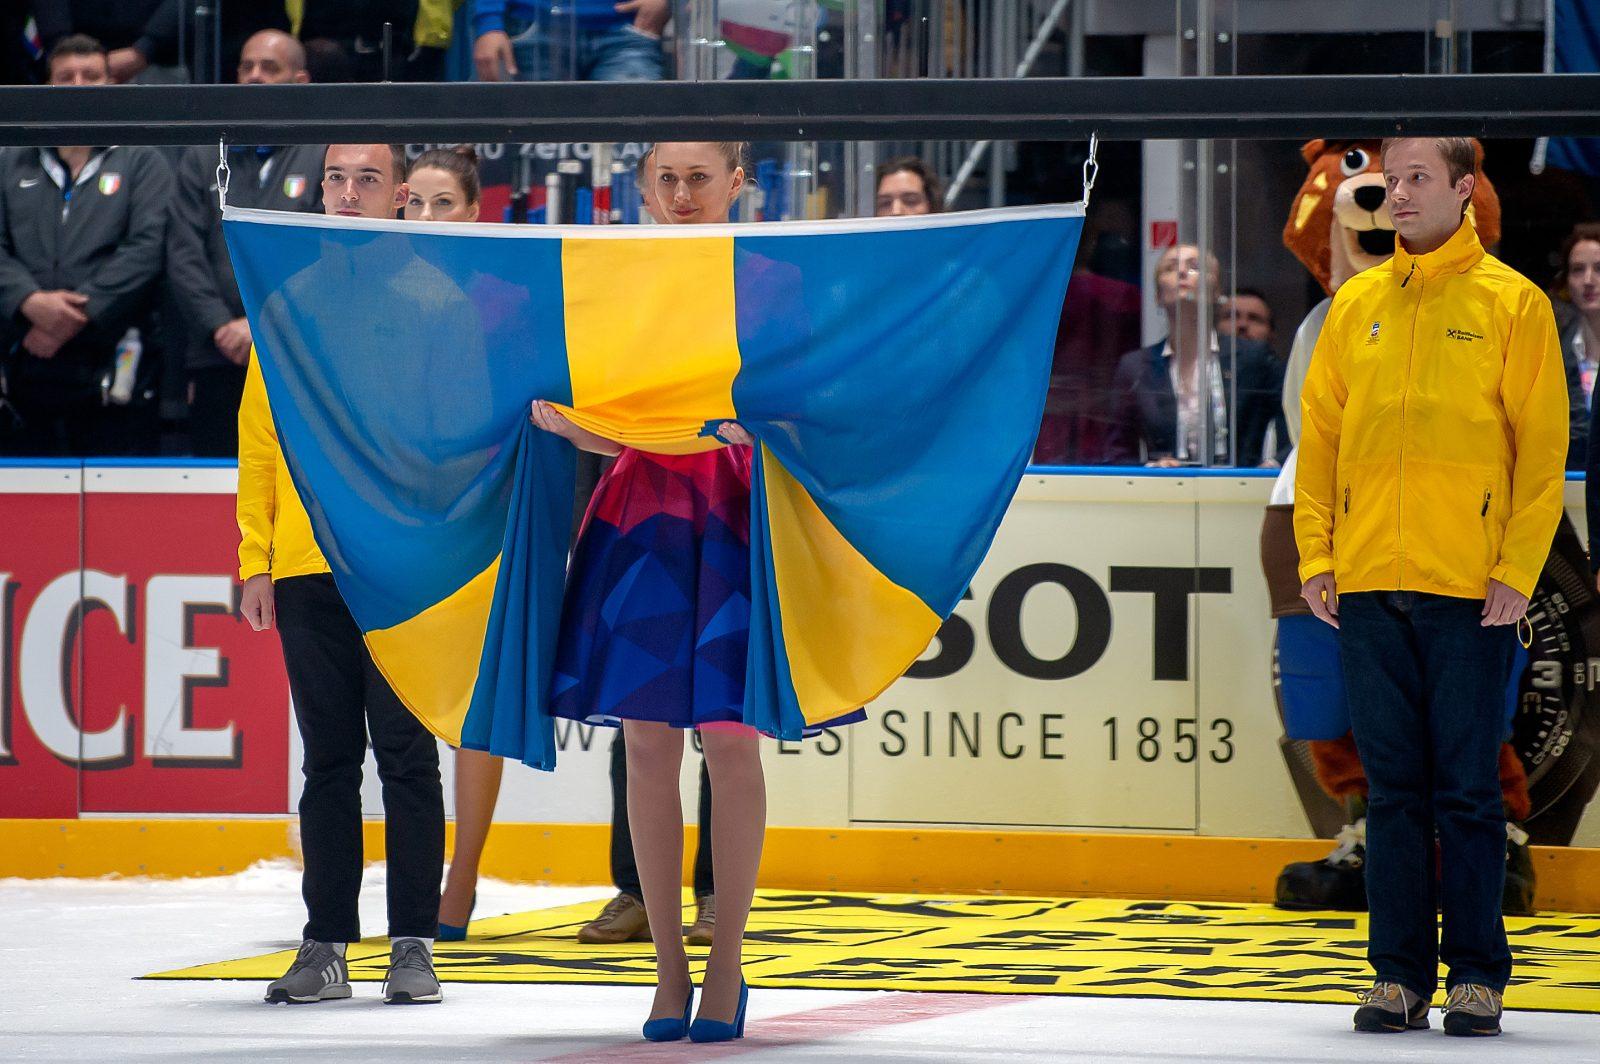 VM 2019: Supporterspecial Tre Kronor